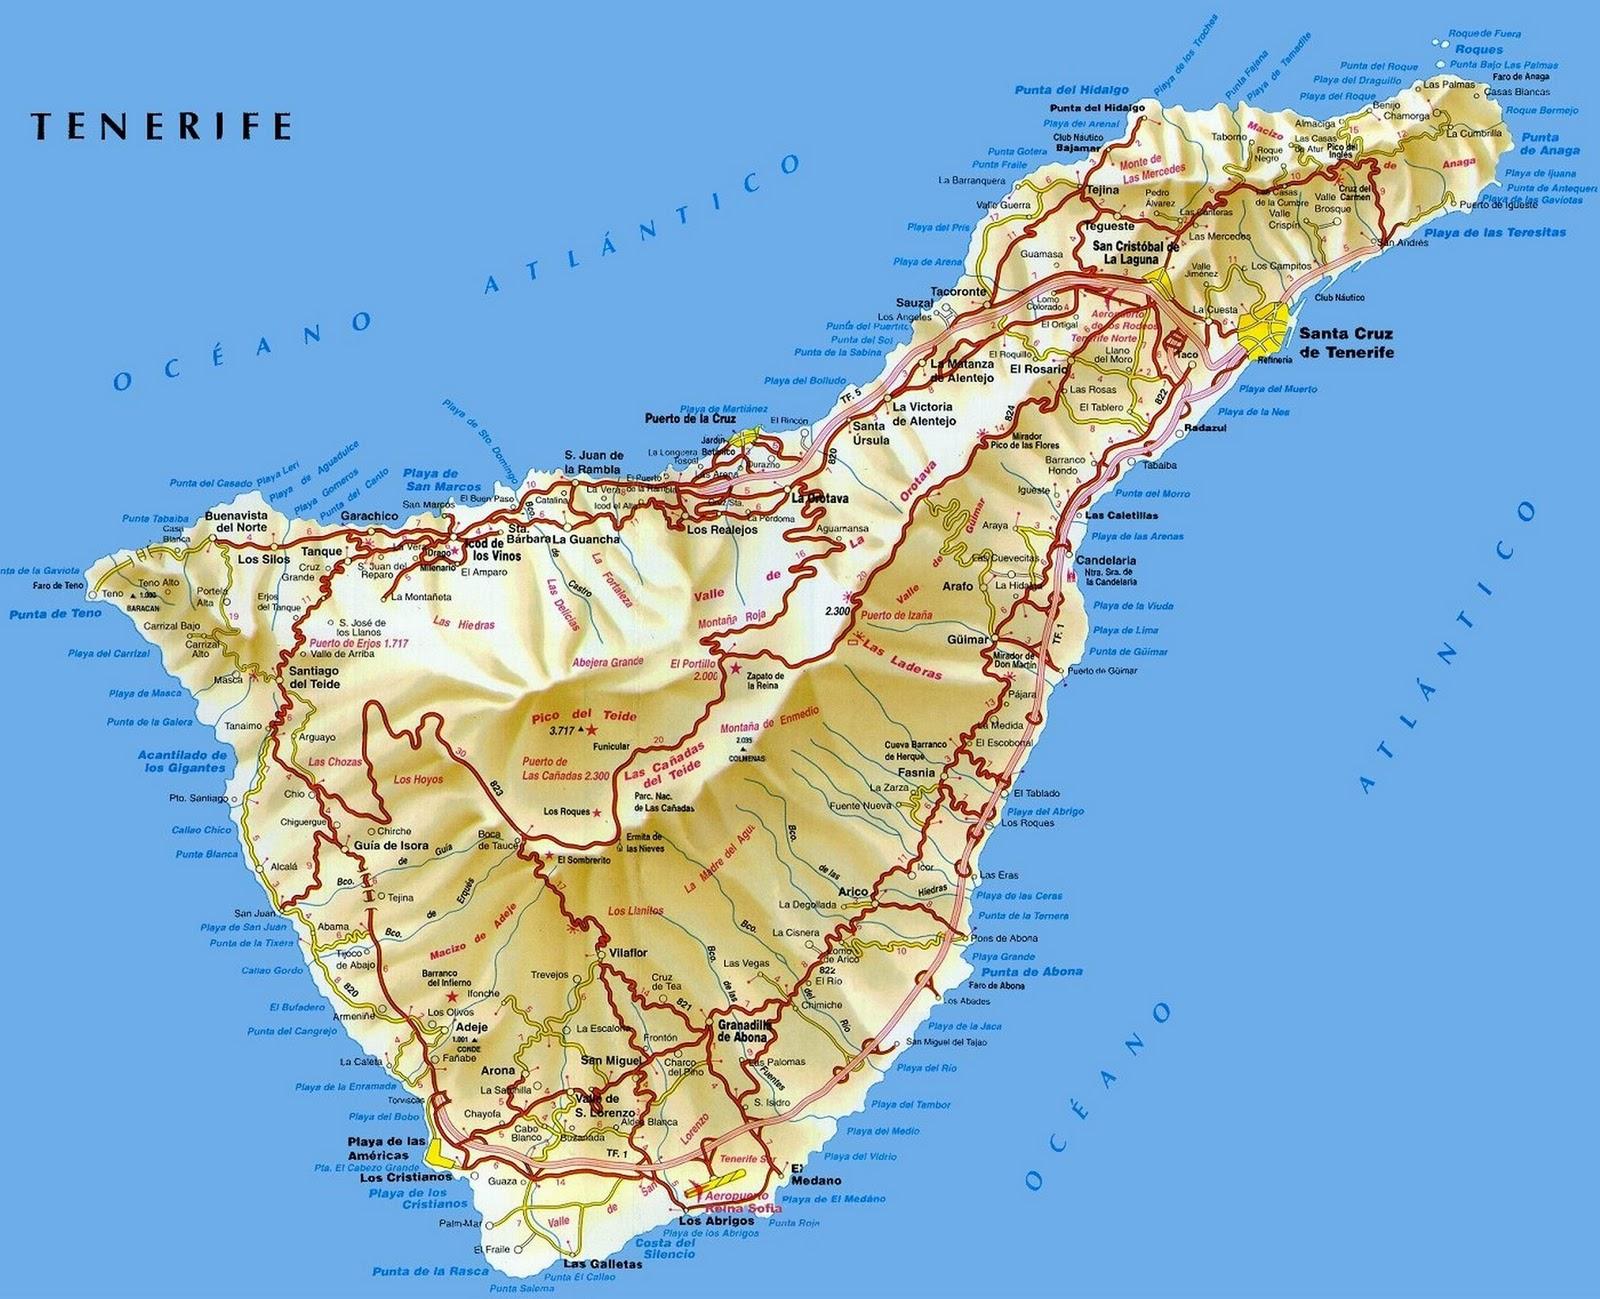 Siete islas en bicicleta diciembre 2010 - Guia de tenerife pdf ...